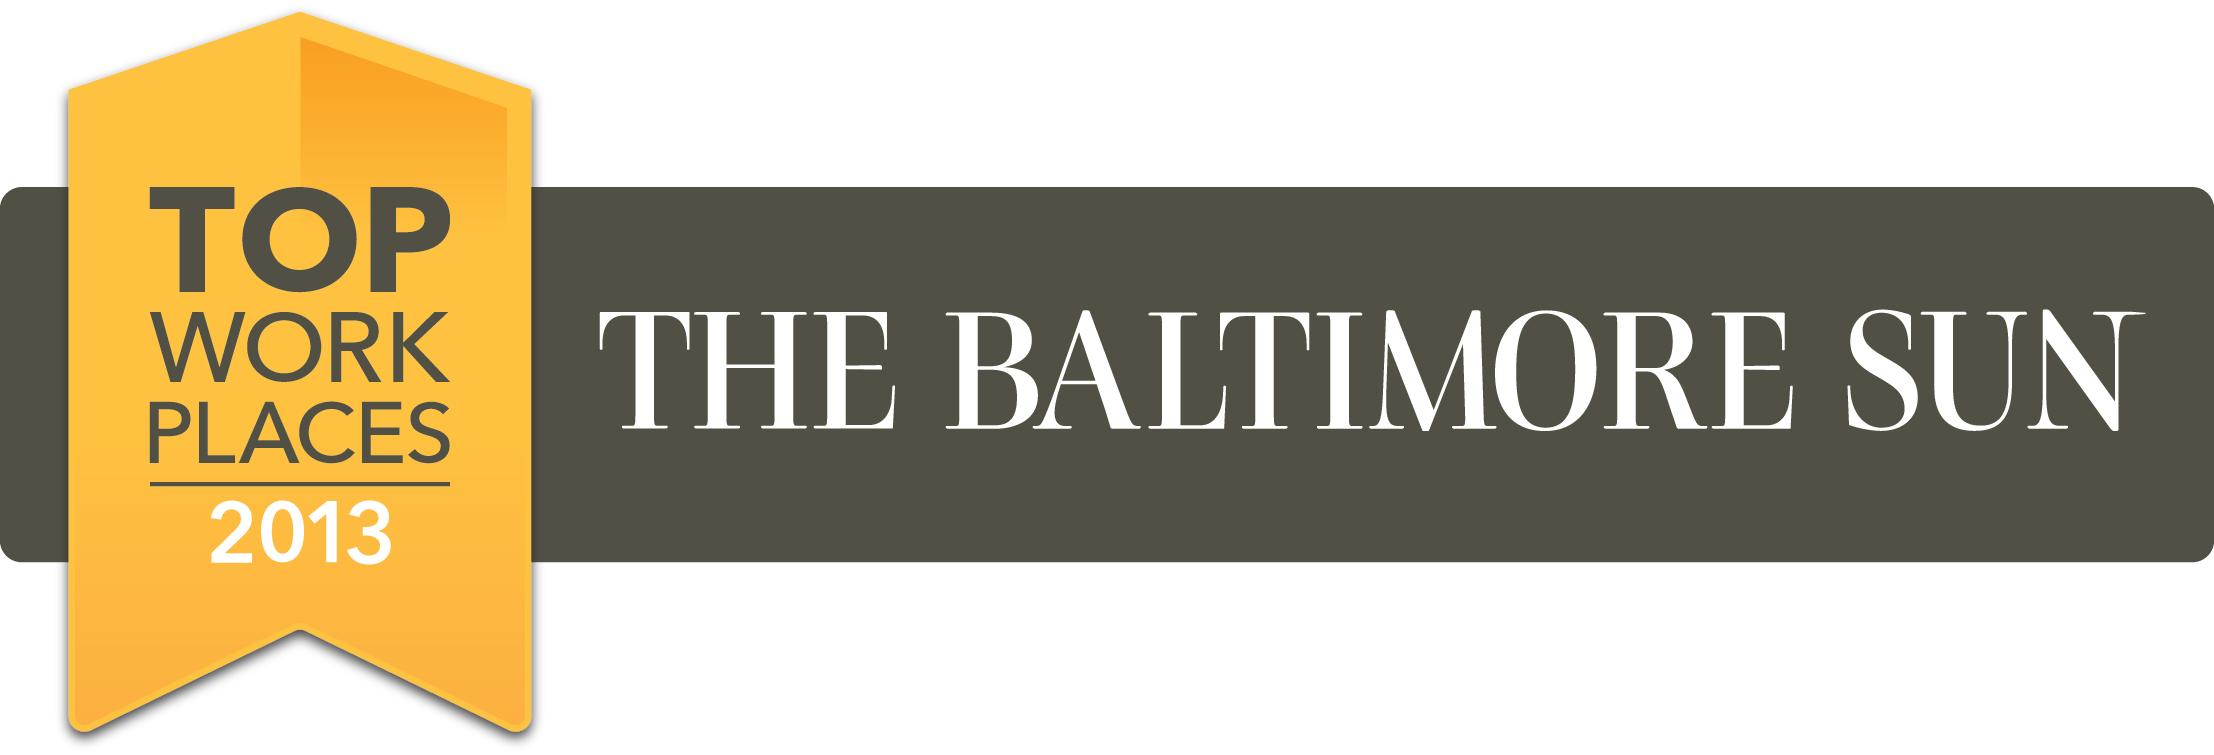 TWP_Baltimore_2013_AW.jpg